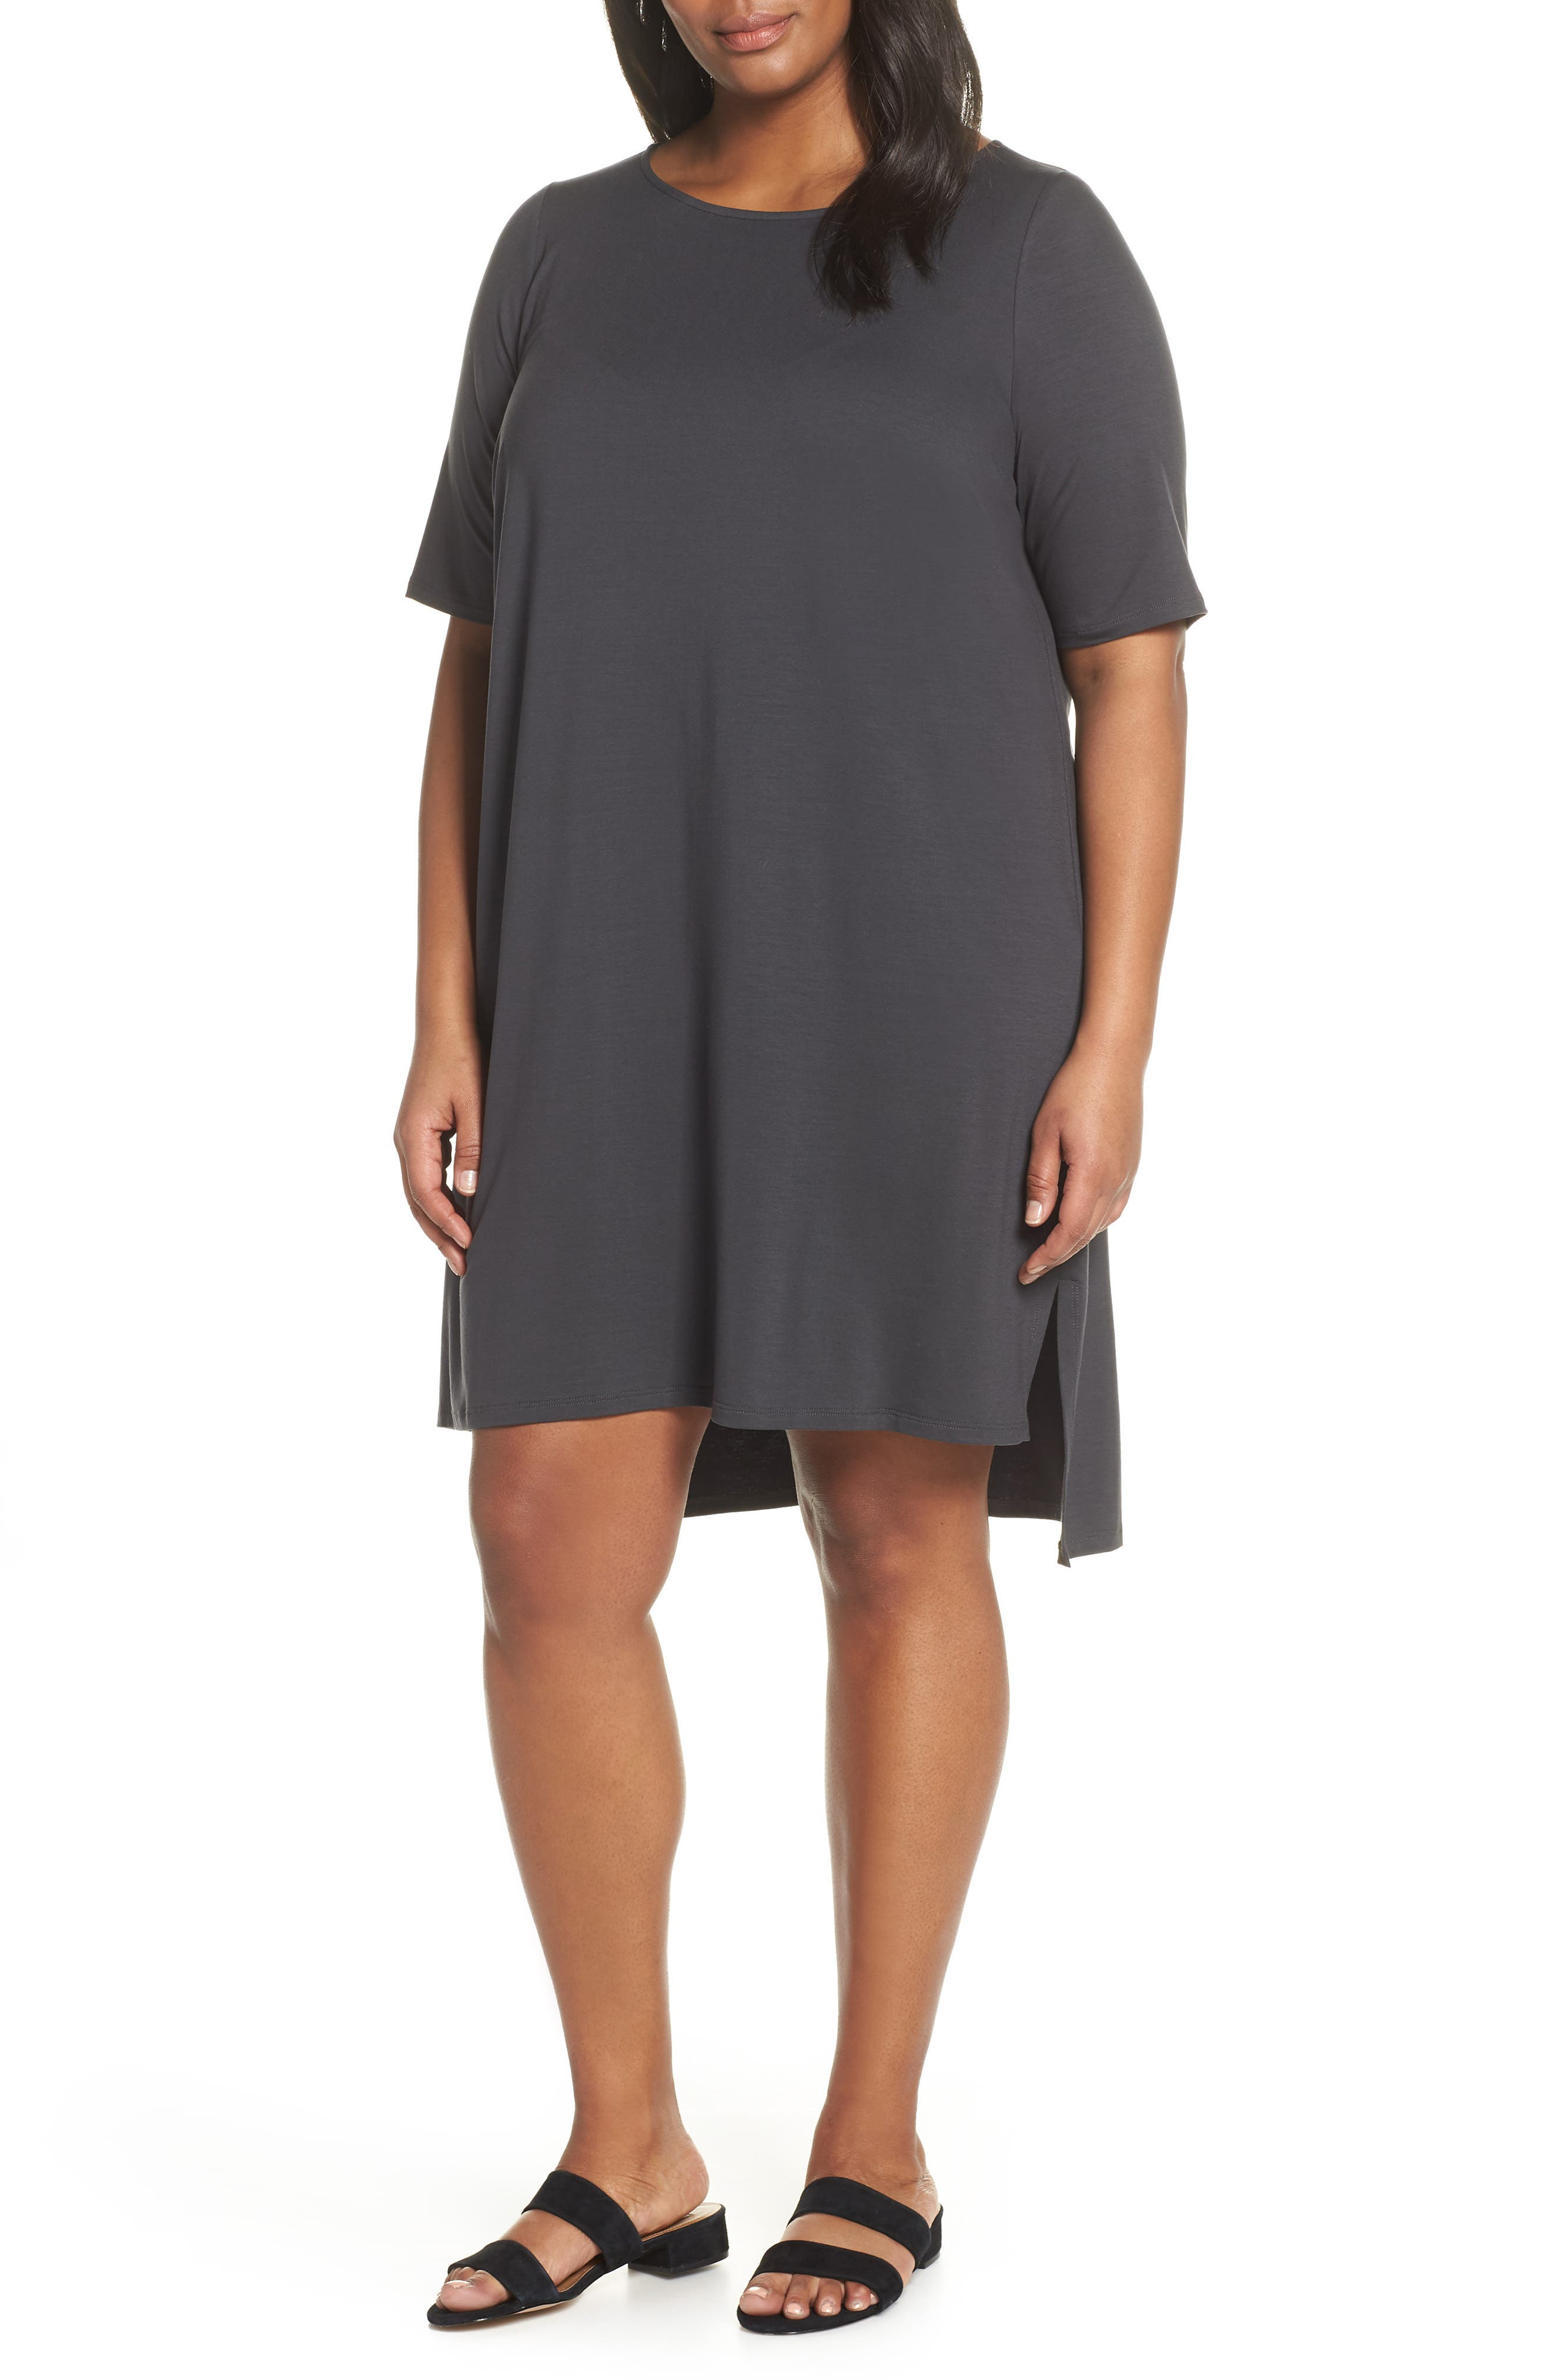 Plus Size Eileen Fisher Shift Dress